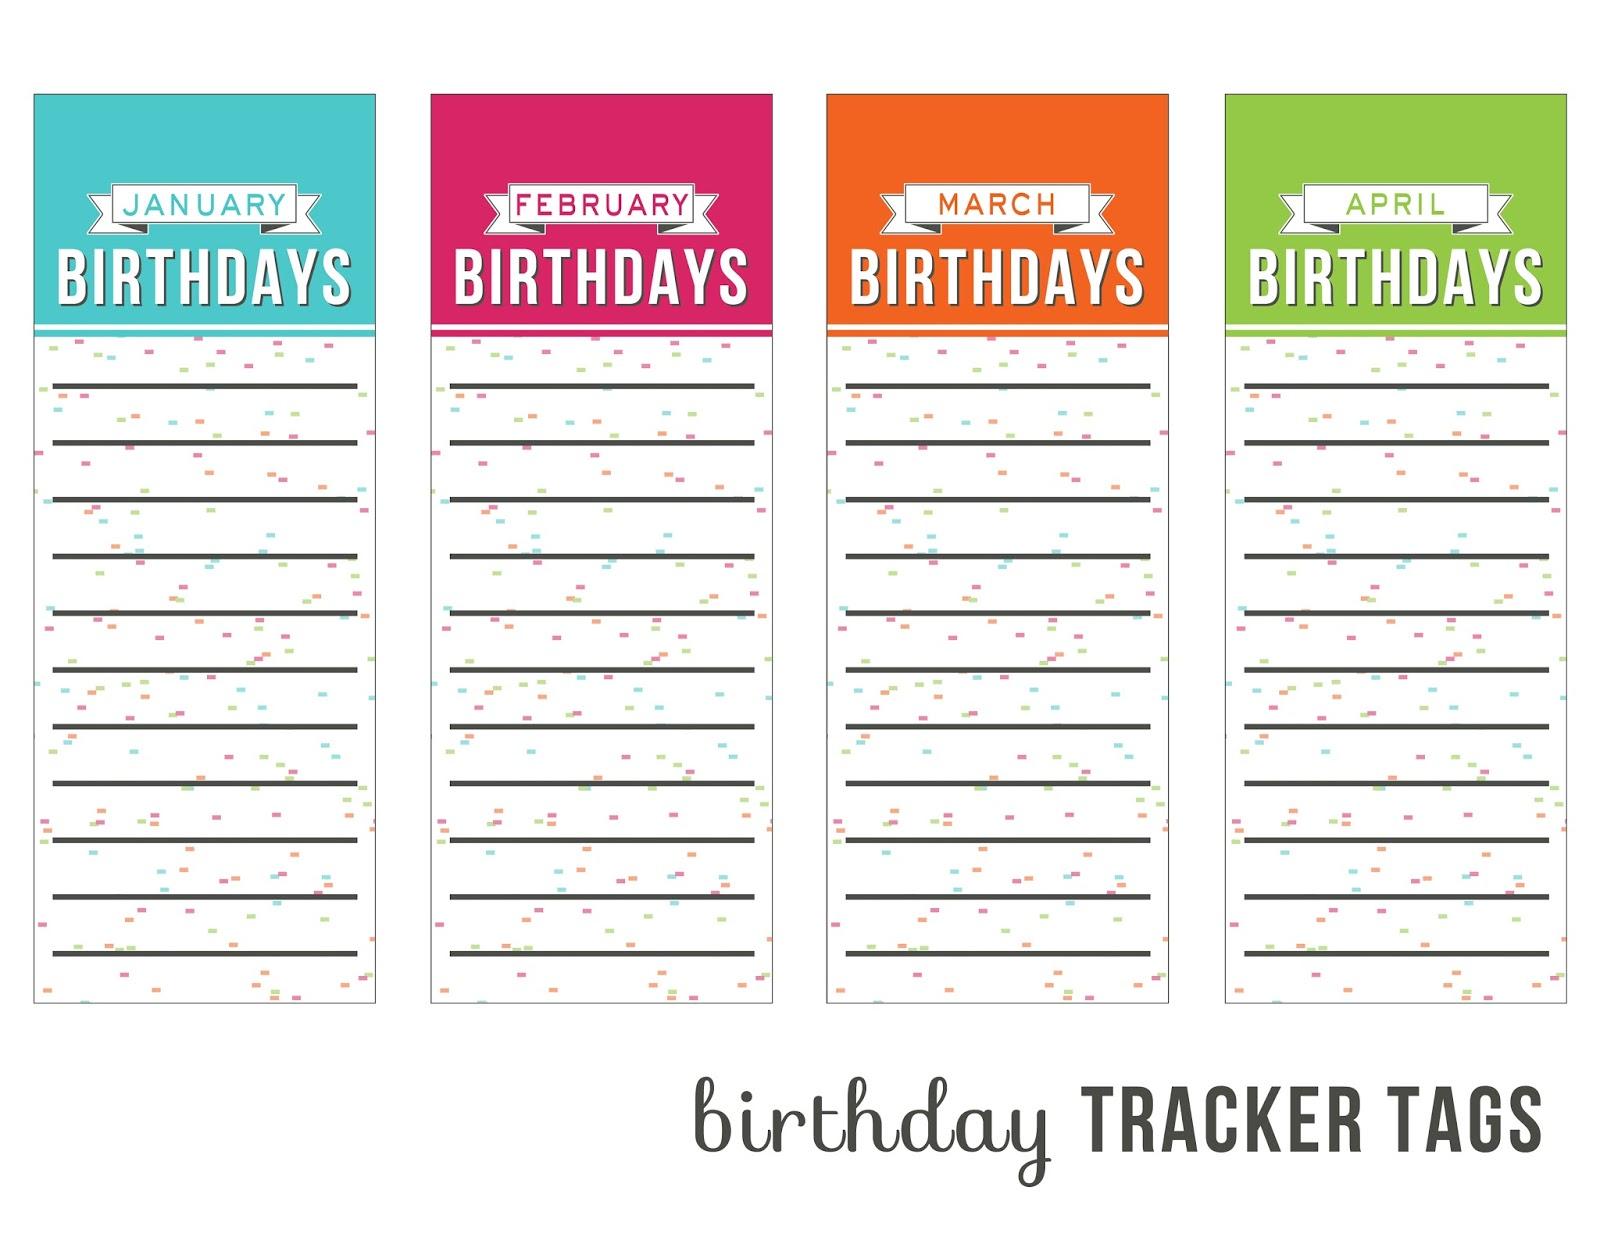 http://3.bp.blogspot.com/-akp_iEpgfe8/U9g6o8KhzcI/AAAAAAAAL_0/xLyhd7K_tfM/s1600/birthday+tracker+tags.jpg